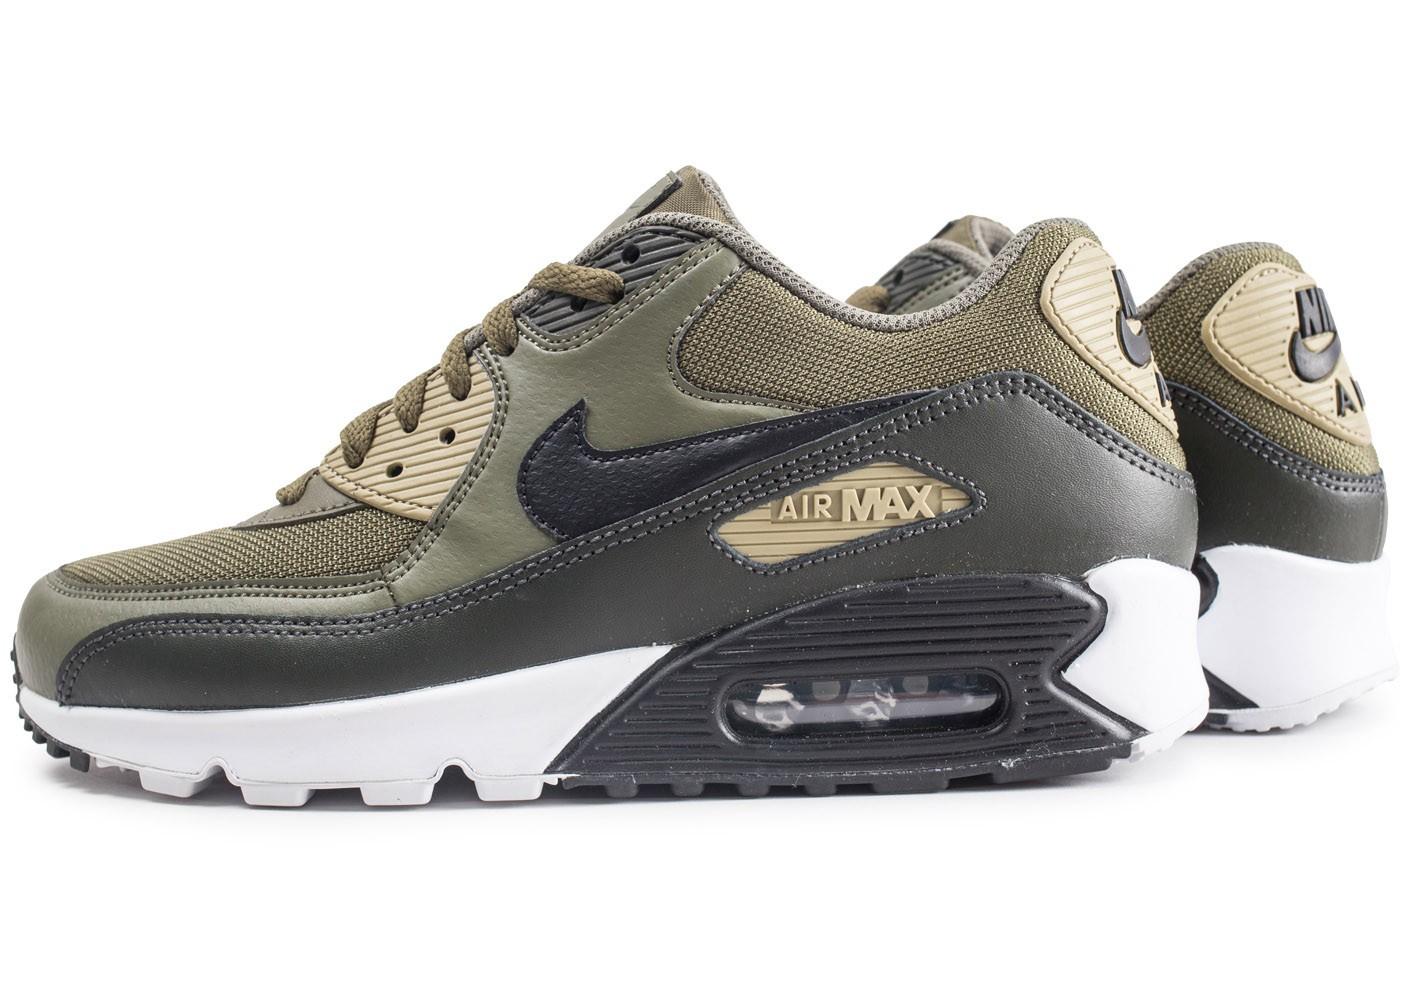 nike air max 90 kaki homme,Nike Air Max Nike Air Max 90 Kaki